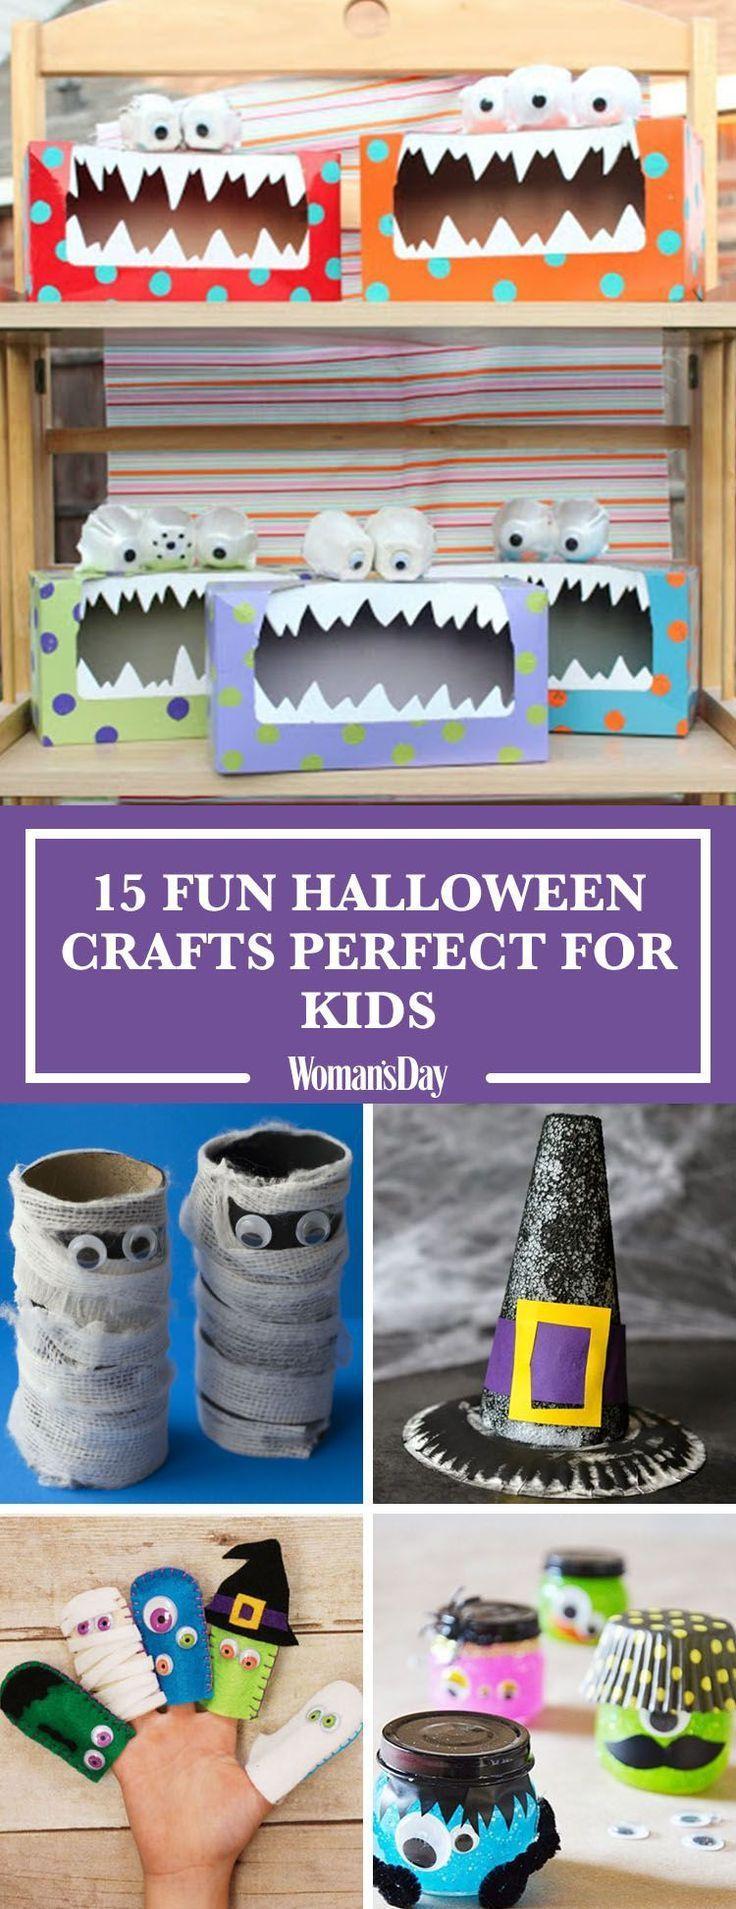 25+ Fun and Creative Halloween Crafts for Kids #octobercraftsforkids